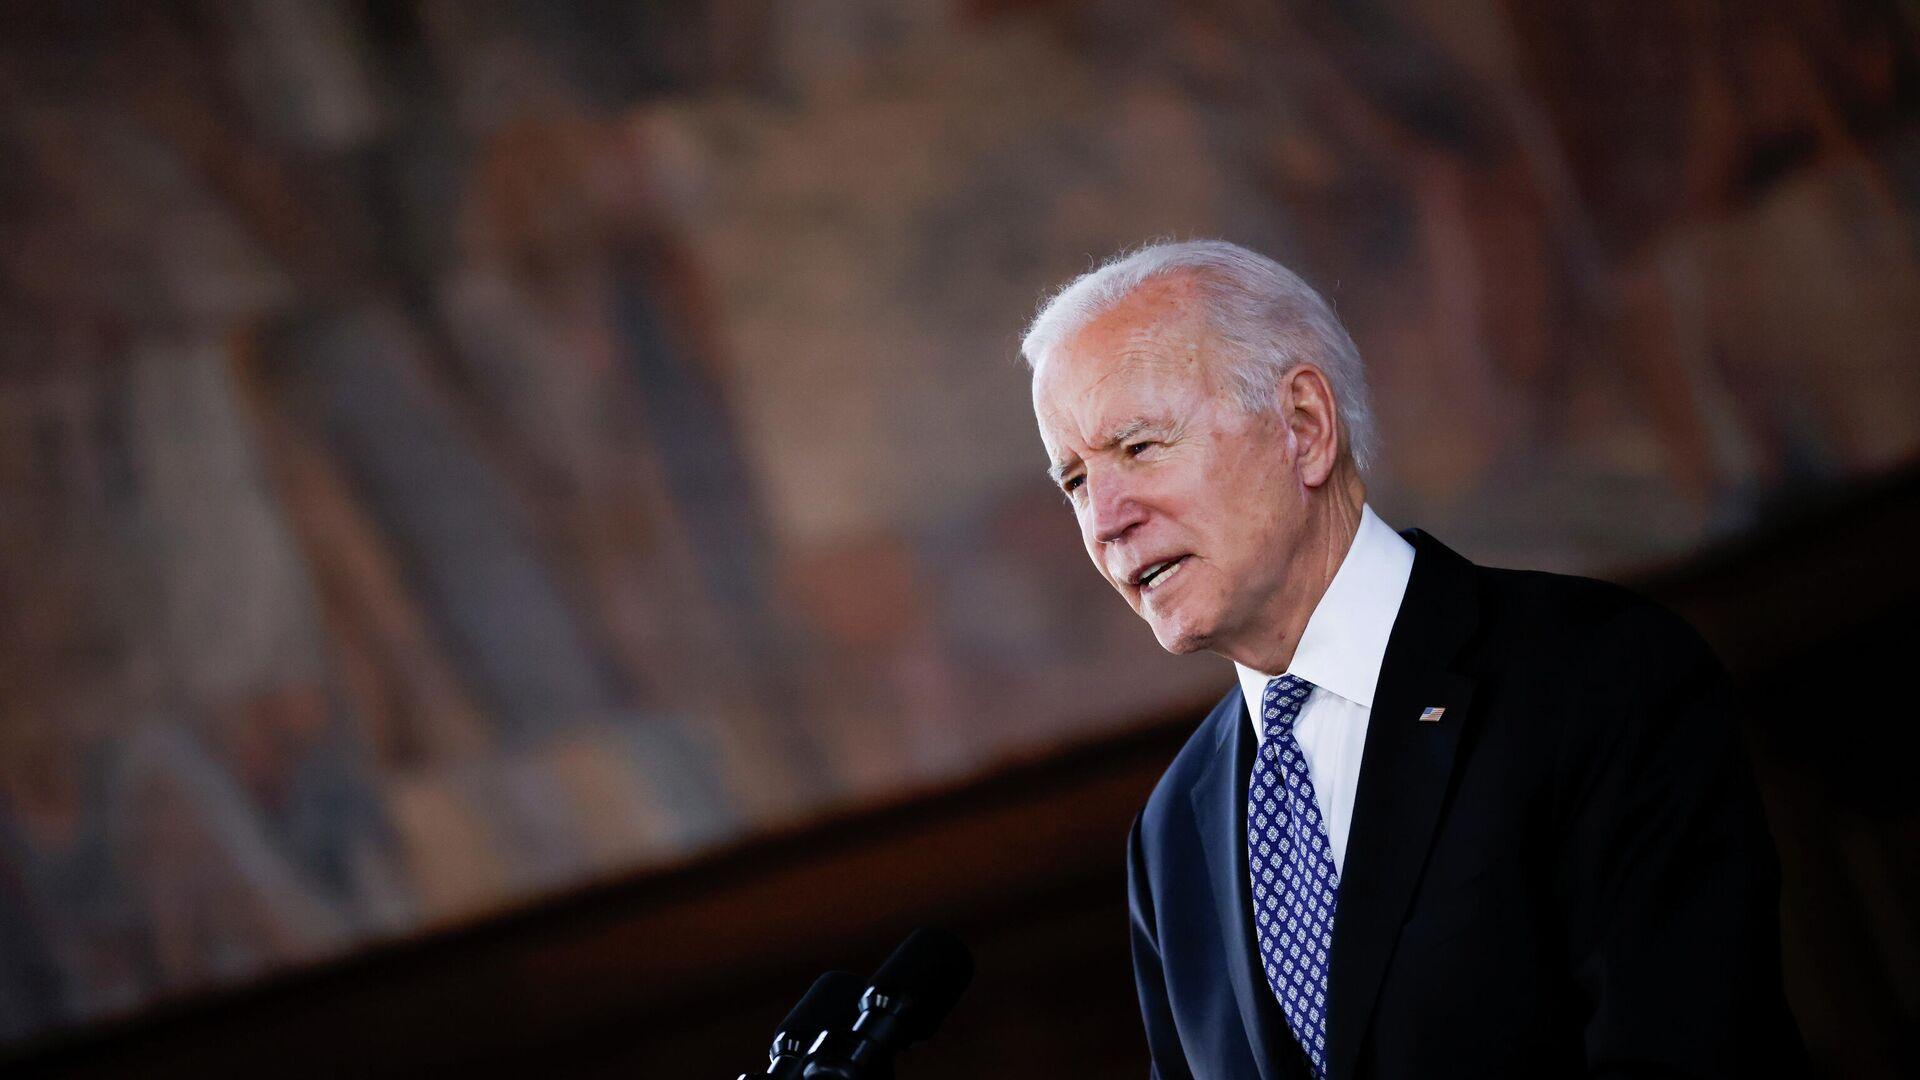 Joe Biden, presidente de EEUU - Sputnik Mundo, 1920, 02.04.2021